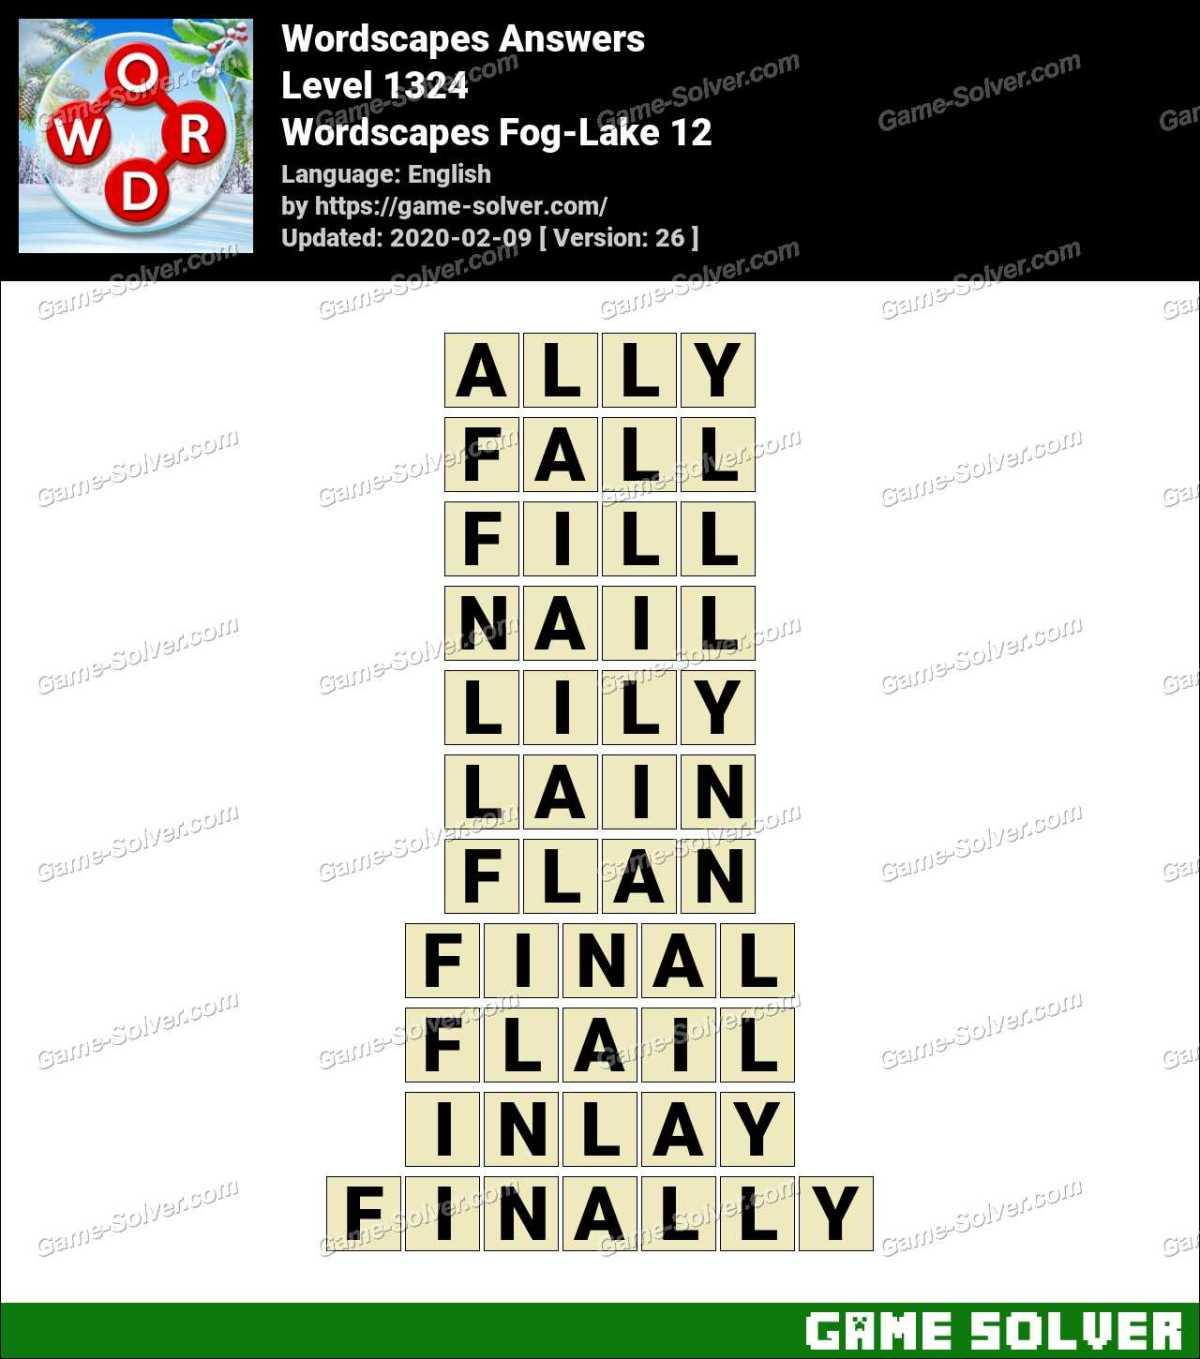 Wordscapes Fog-Lake 12 Answers